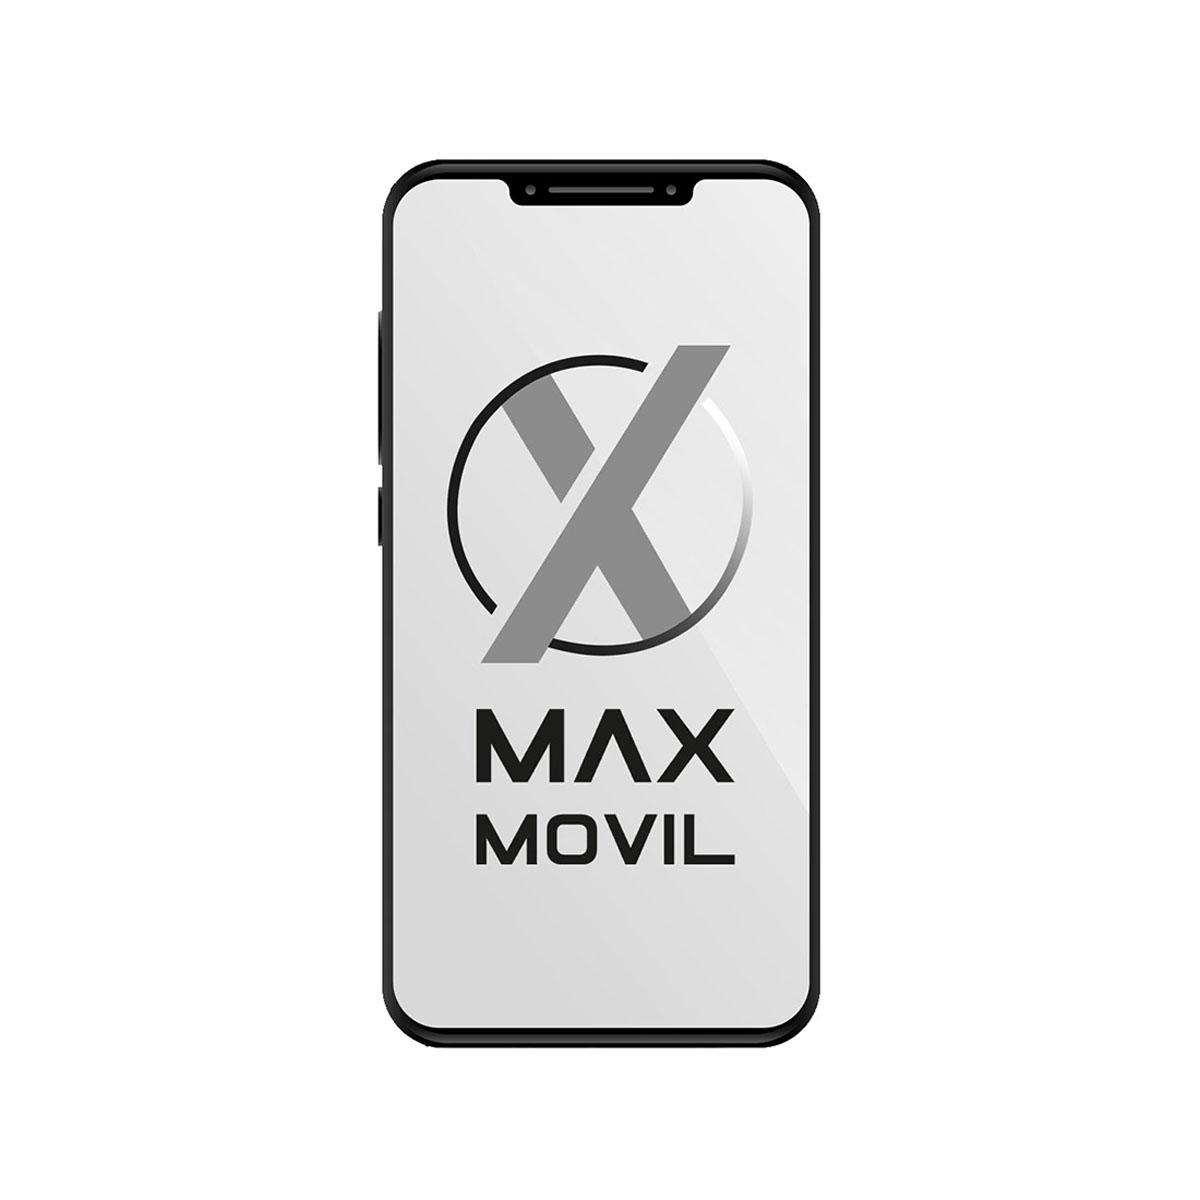 099aff8c5 Comprar Samsung Galaxy J6 Plus Gris · ENVÍO GRATIS · MaxMovil ⓴⓳